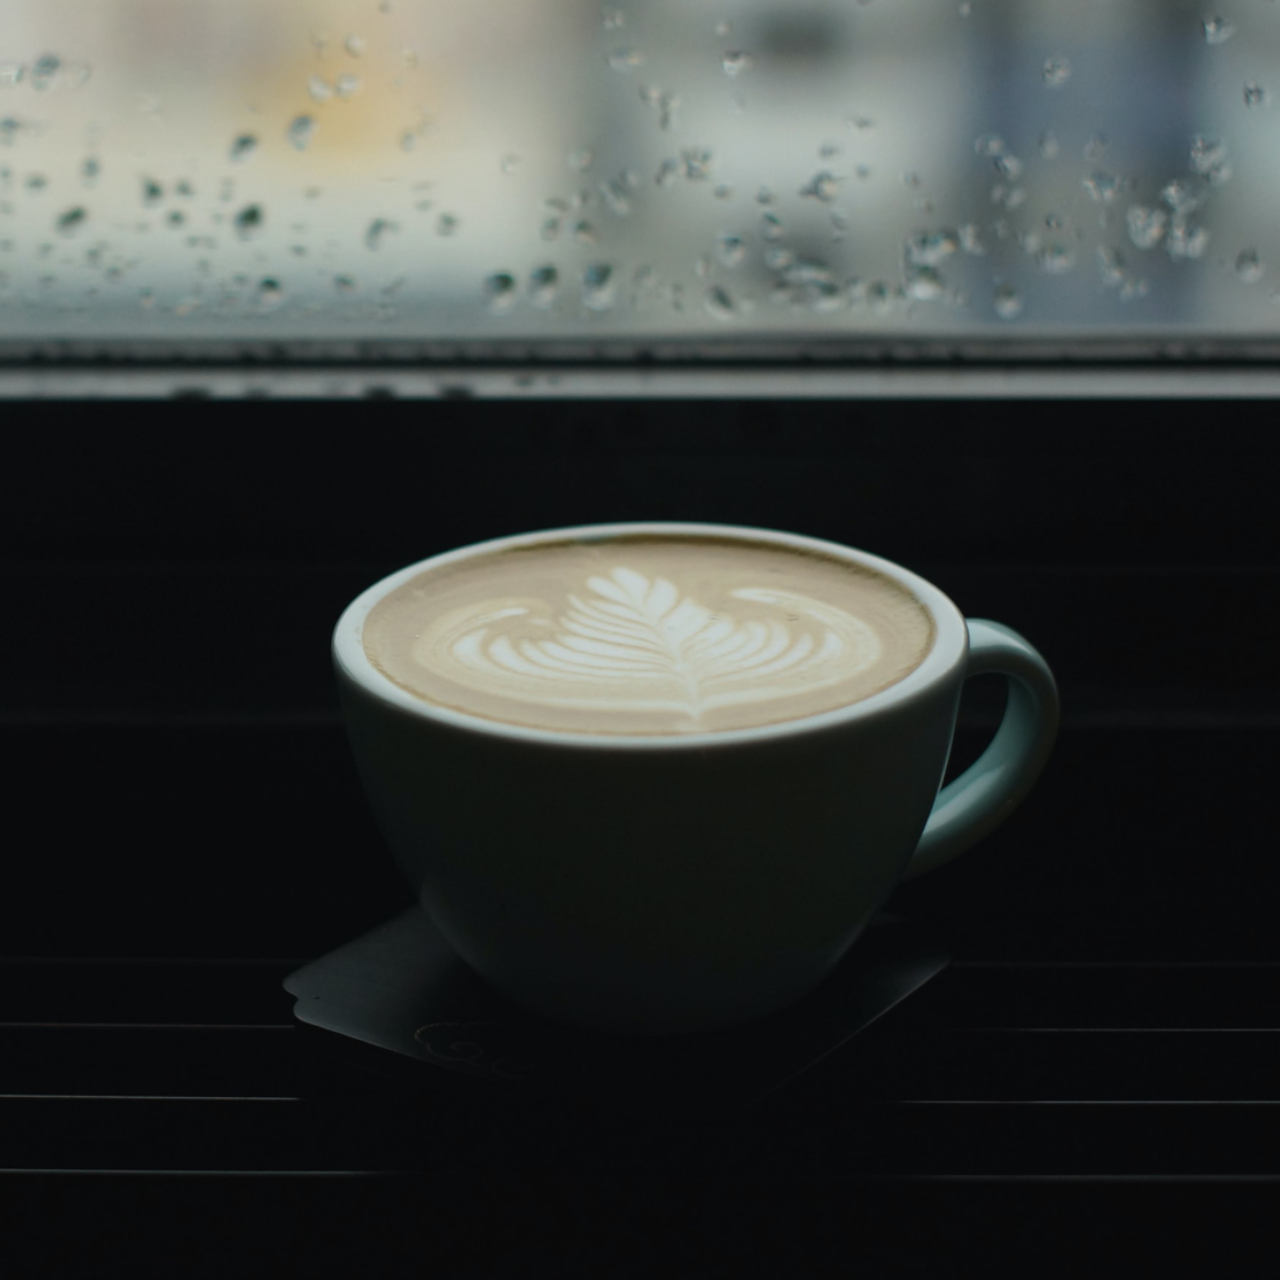 CoffeeCupshikee-hVVbbtrsSNA-unsplash.jpg